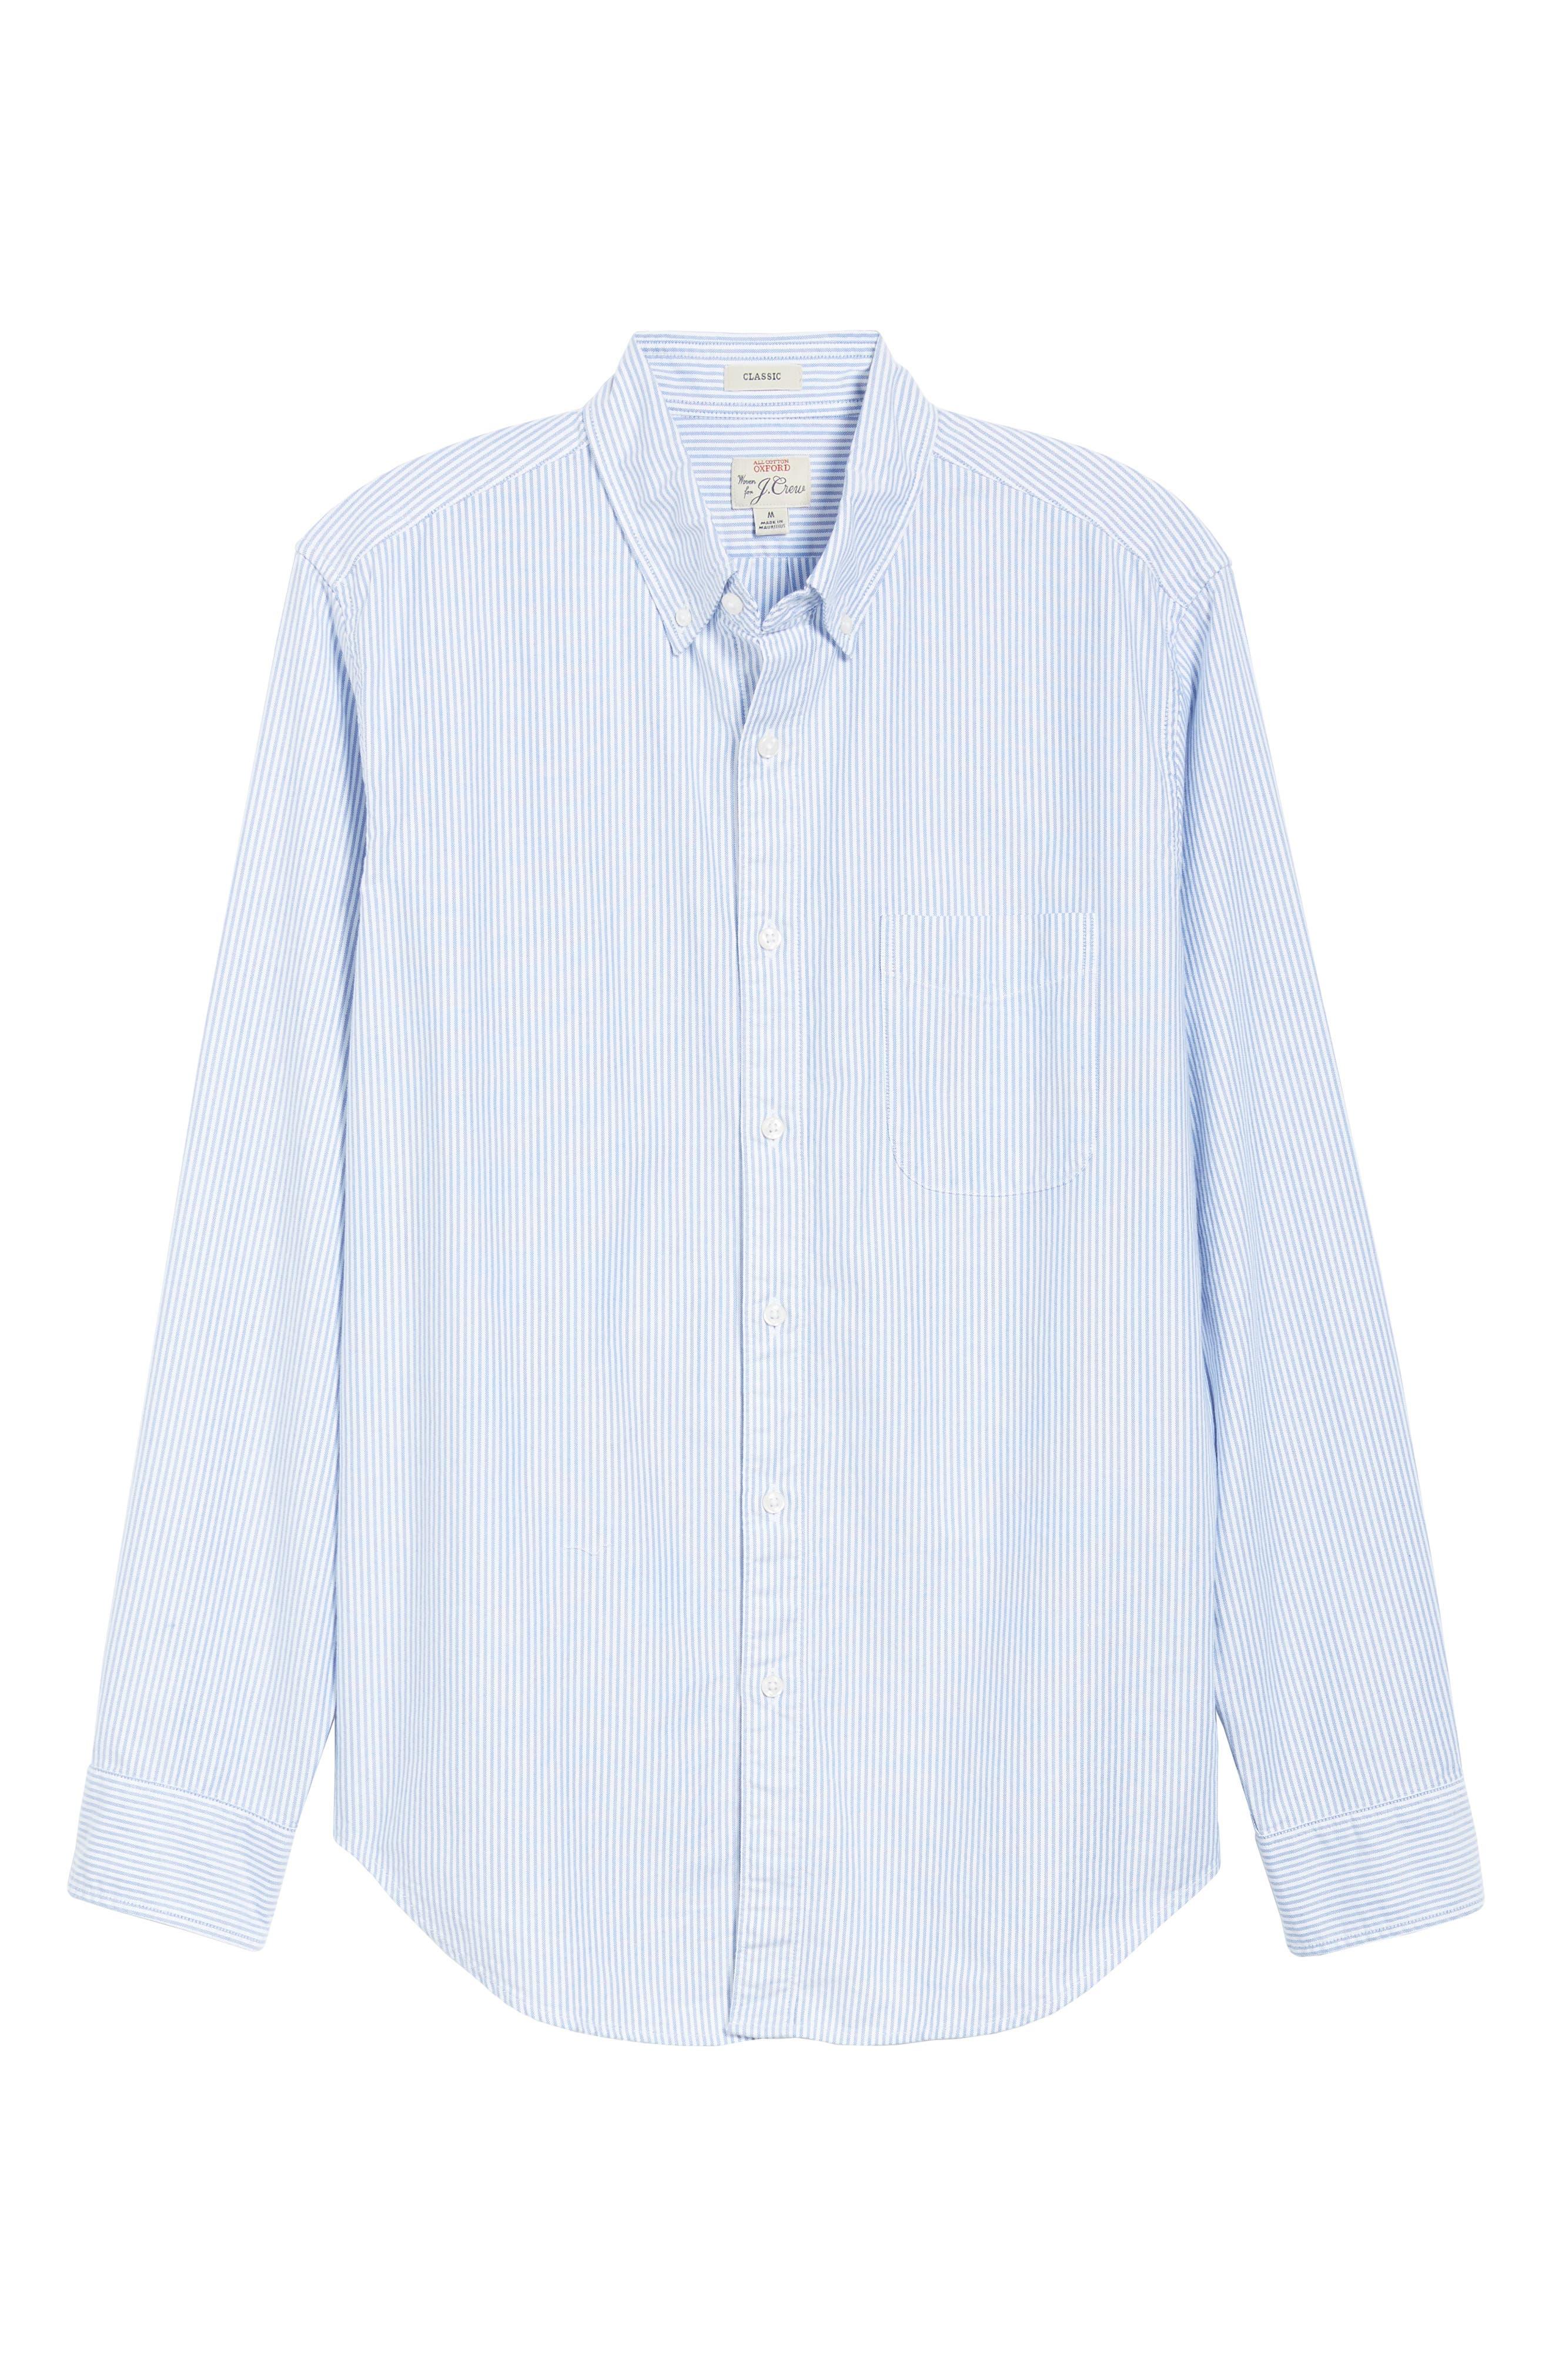 Stripe Pima Cotton Oxford Sport Shirt,                             Alternate thumbnail 5, color,                             RAINCOAT BLUE